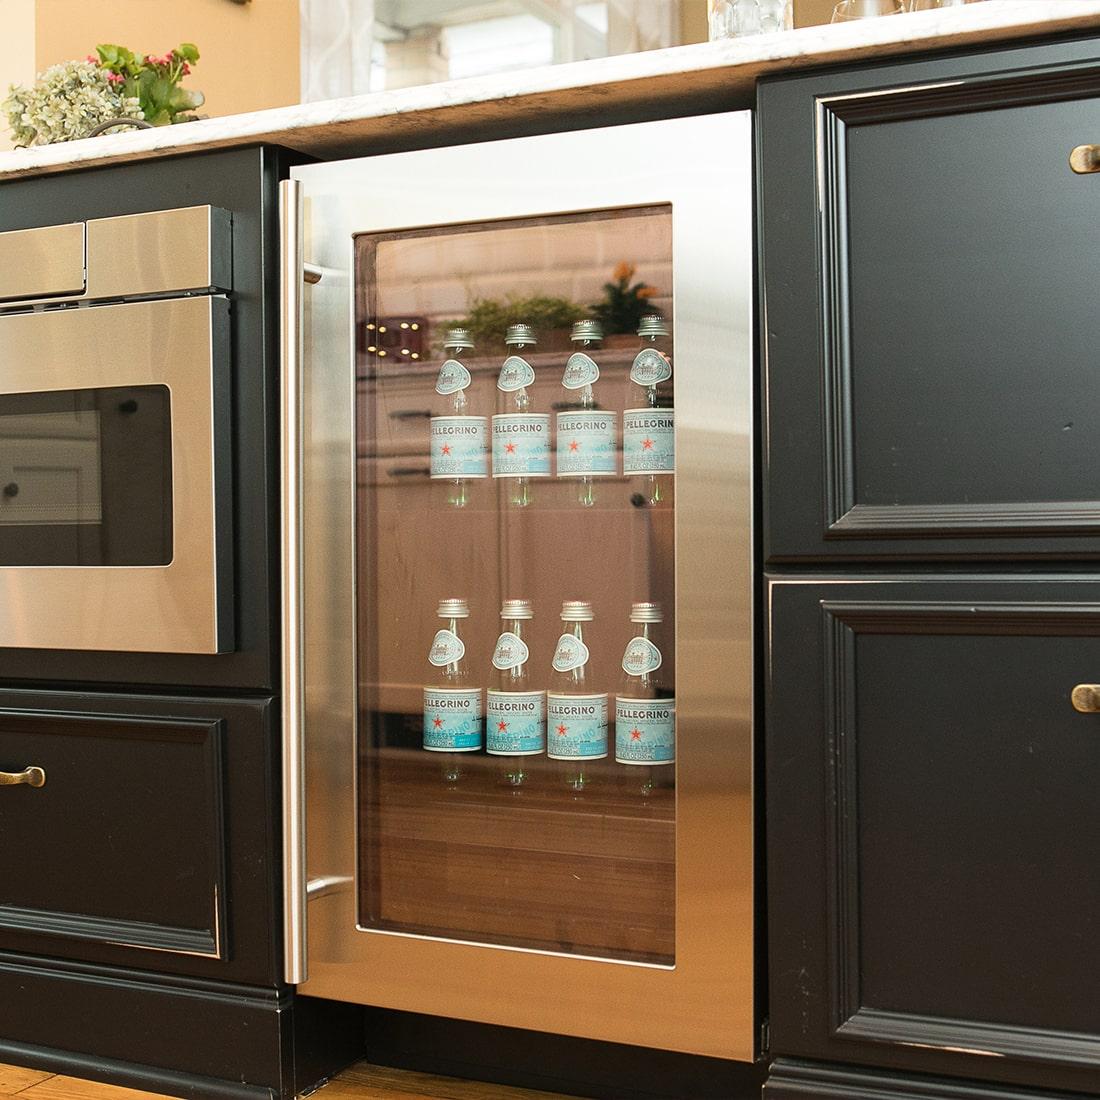 Built in mini fridge in island of renovated kitchen